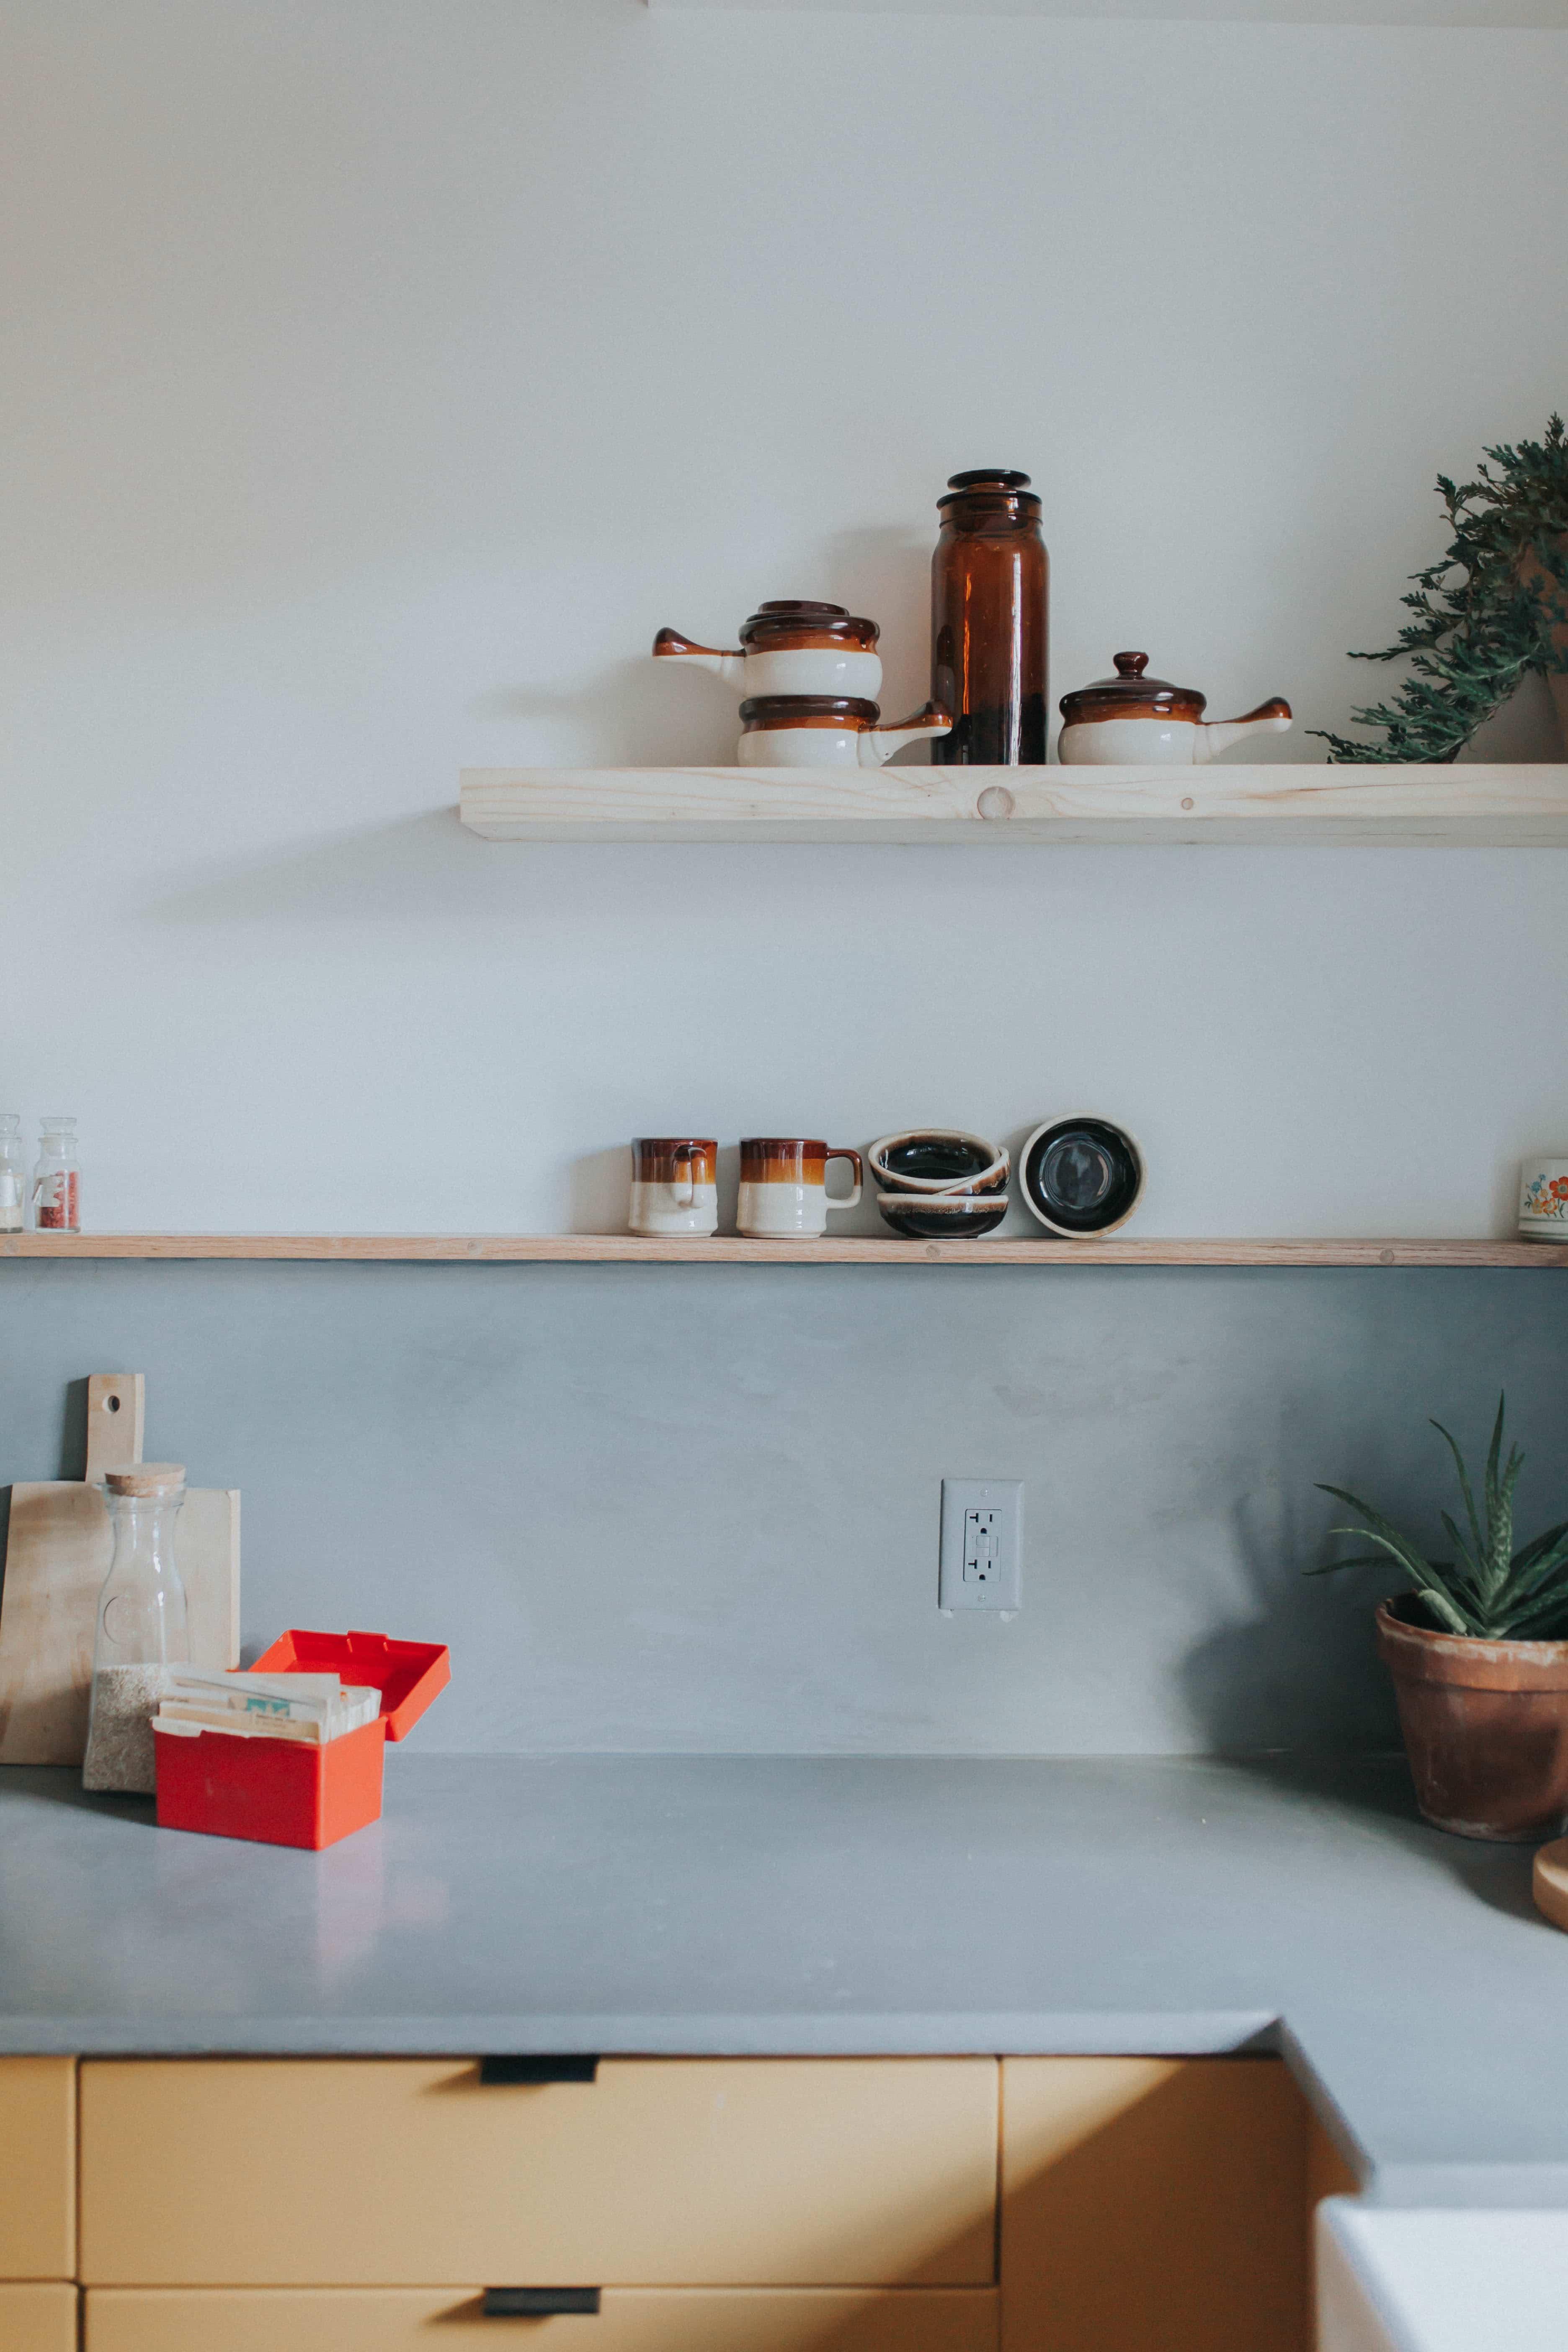 concrete countertops by The Chris & Claude Co.